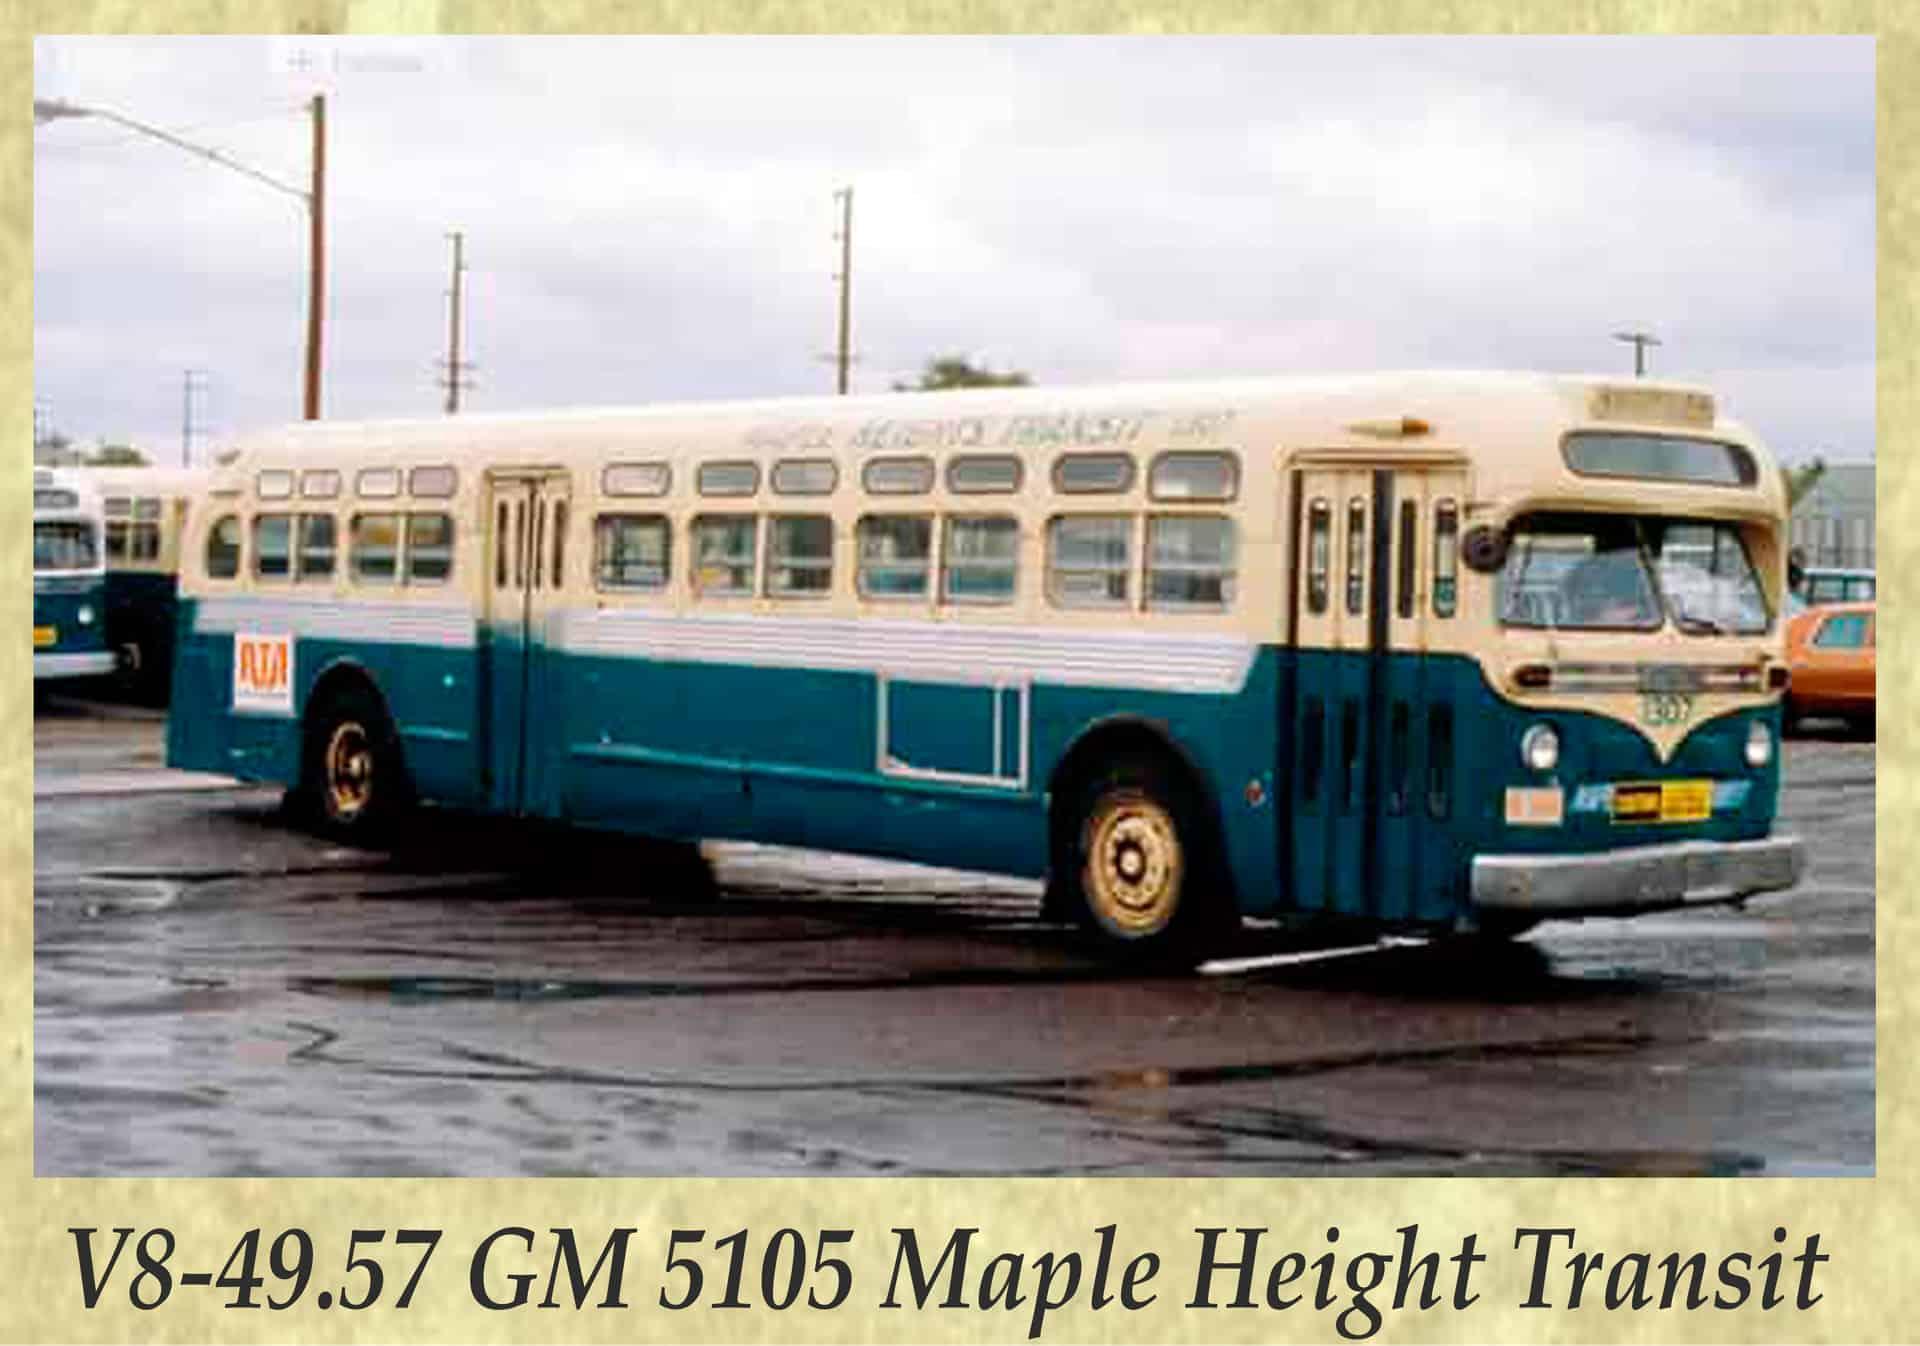 V8-49.57 GM 5105 Maple Height Transit